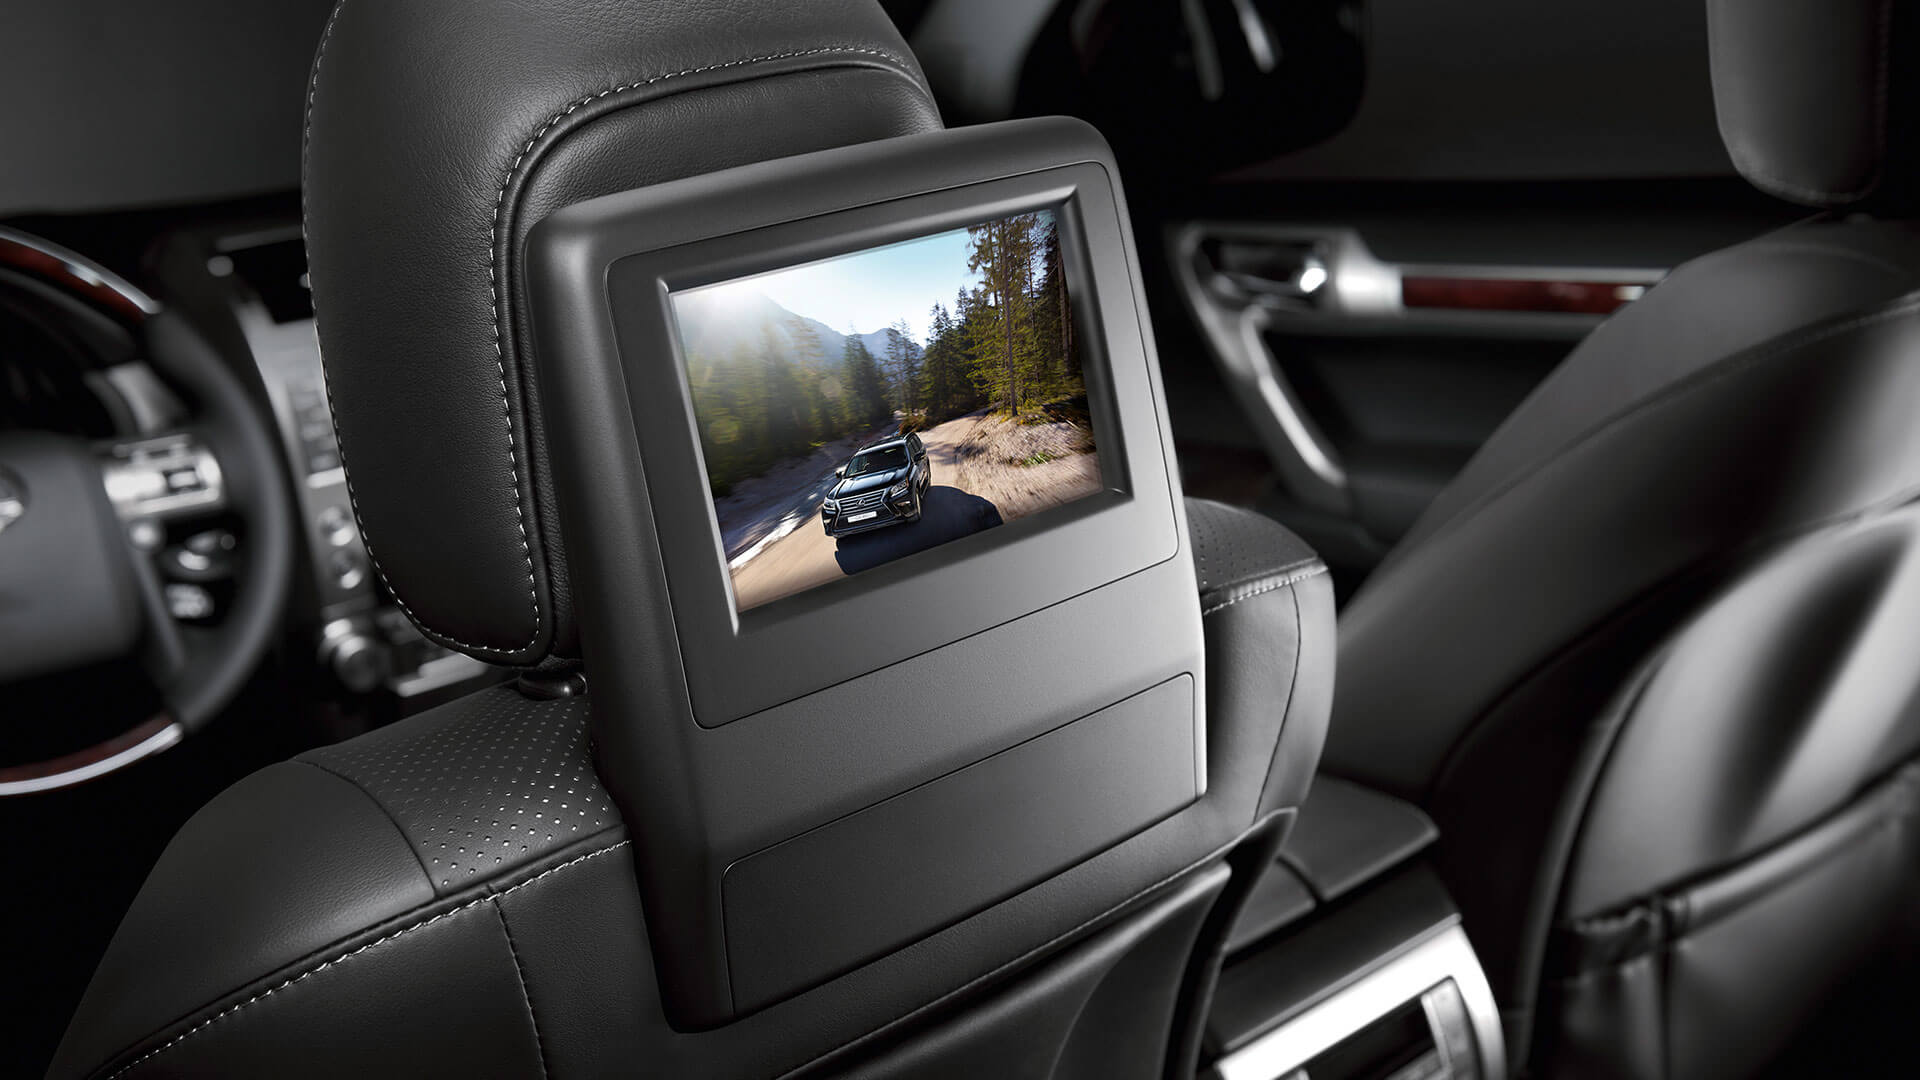 2017 lexus gx 460 features rear seat entertainment